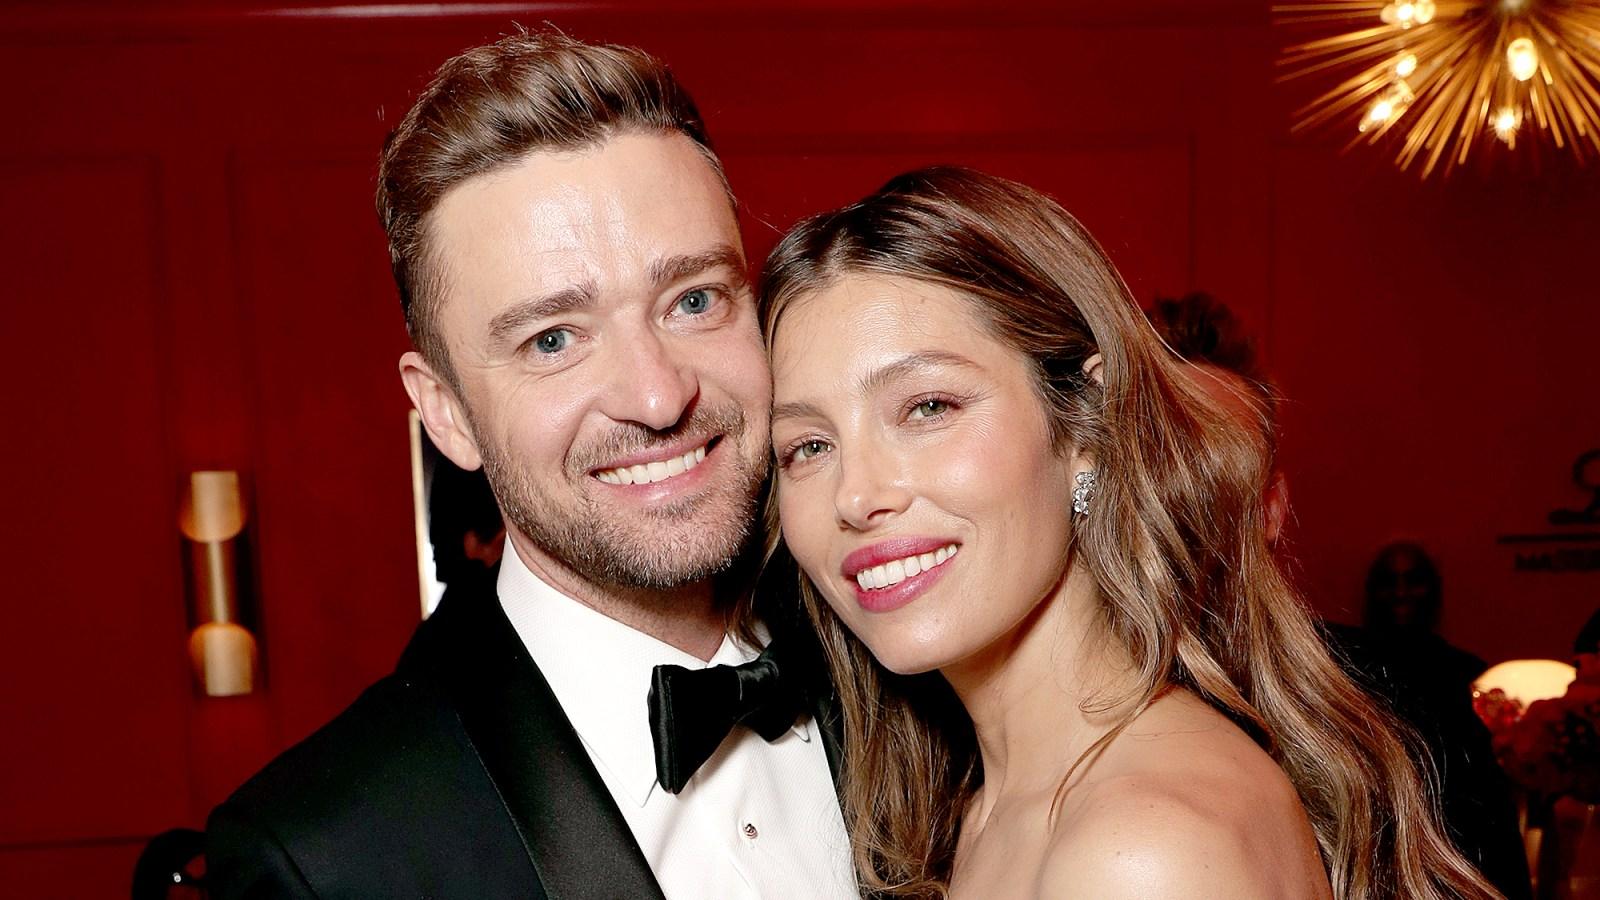 e7eda82bf76 Jessica Biel Takes a Quick Nap on the Way to Celebrate Justin Timberlake s  Birthday  Watch!